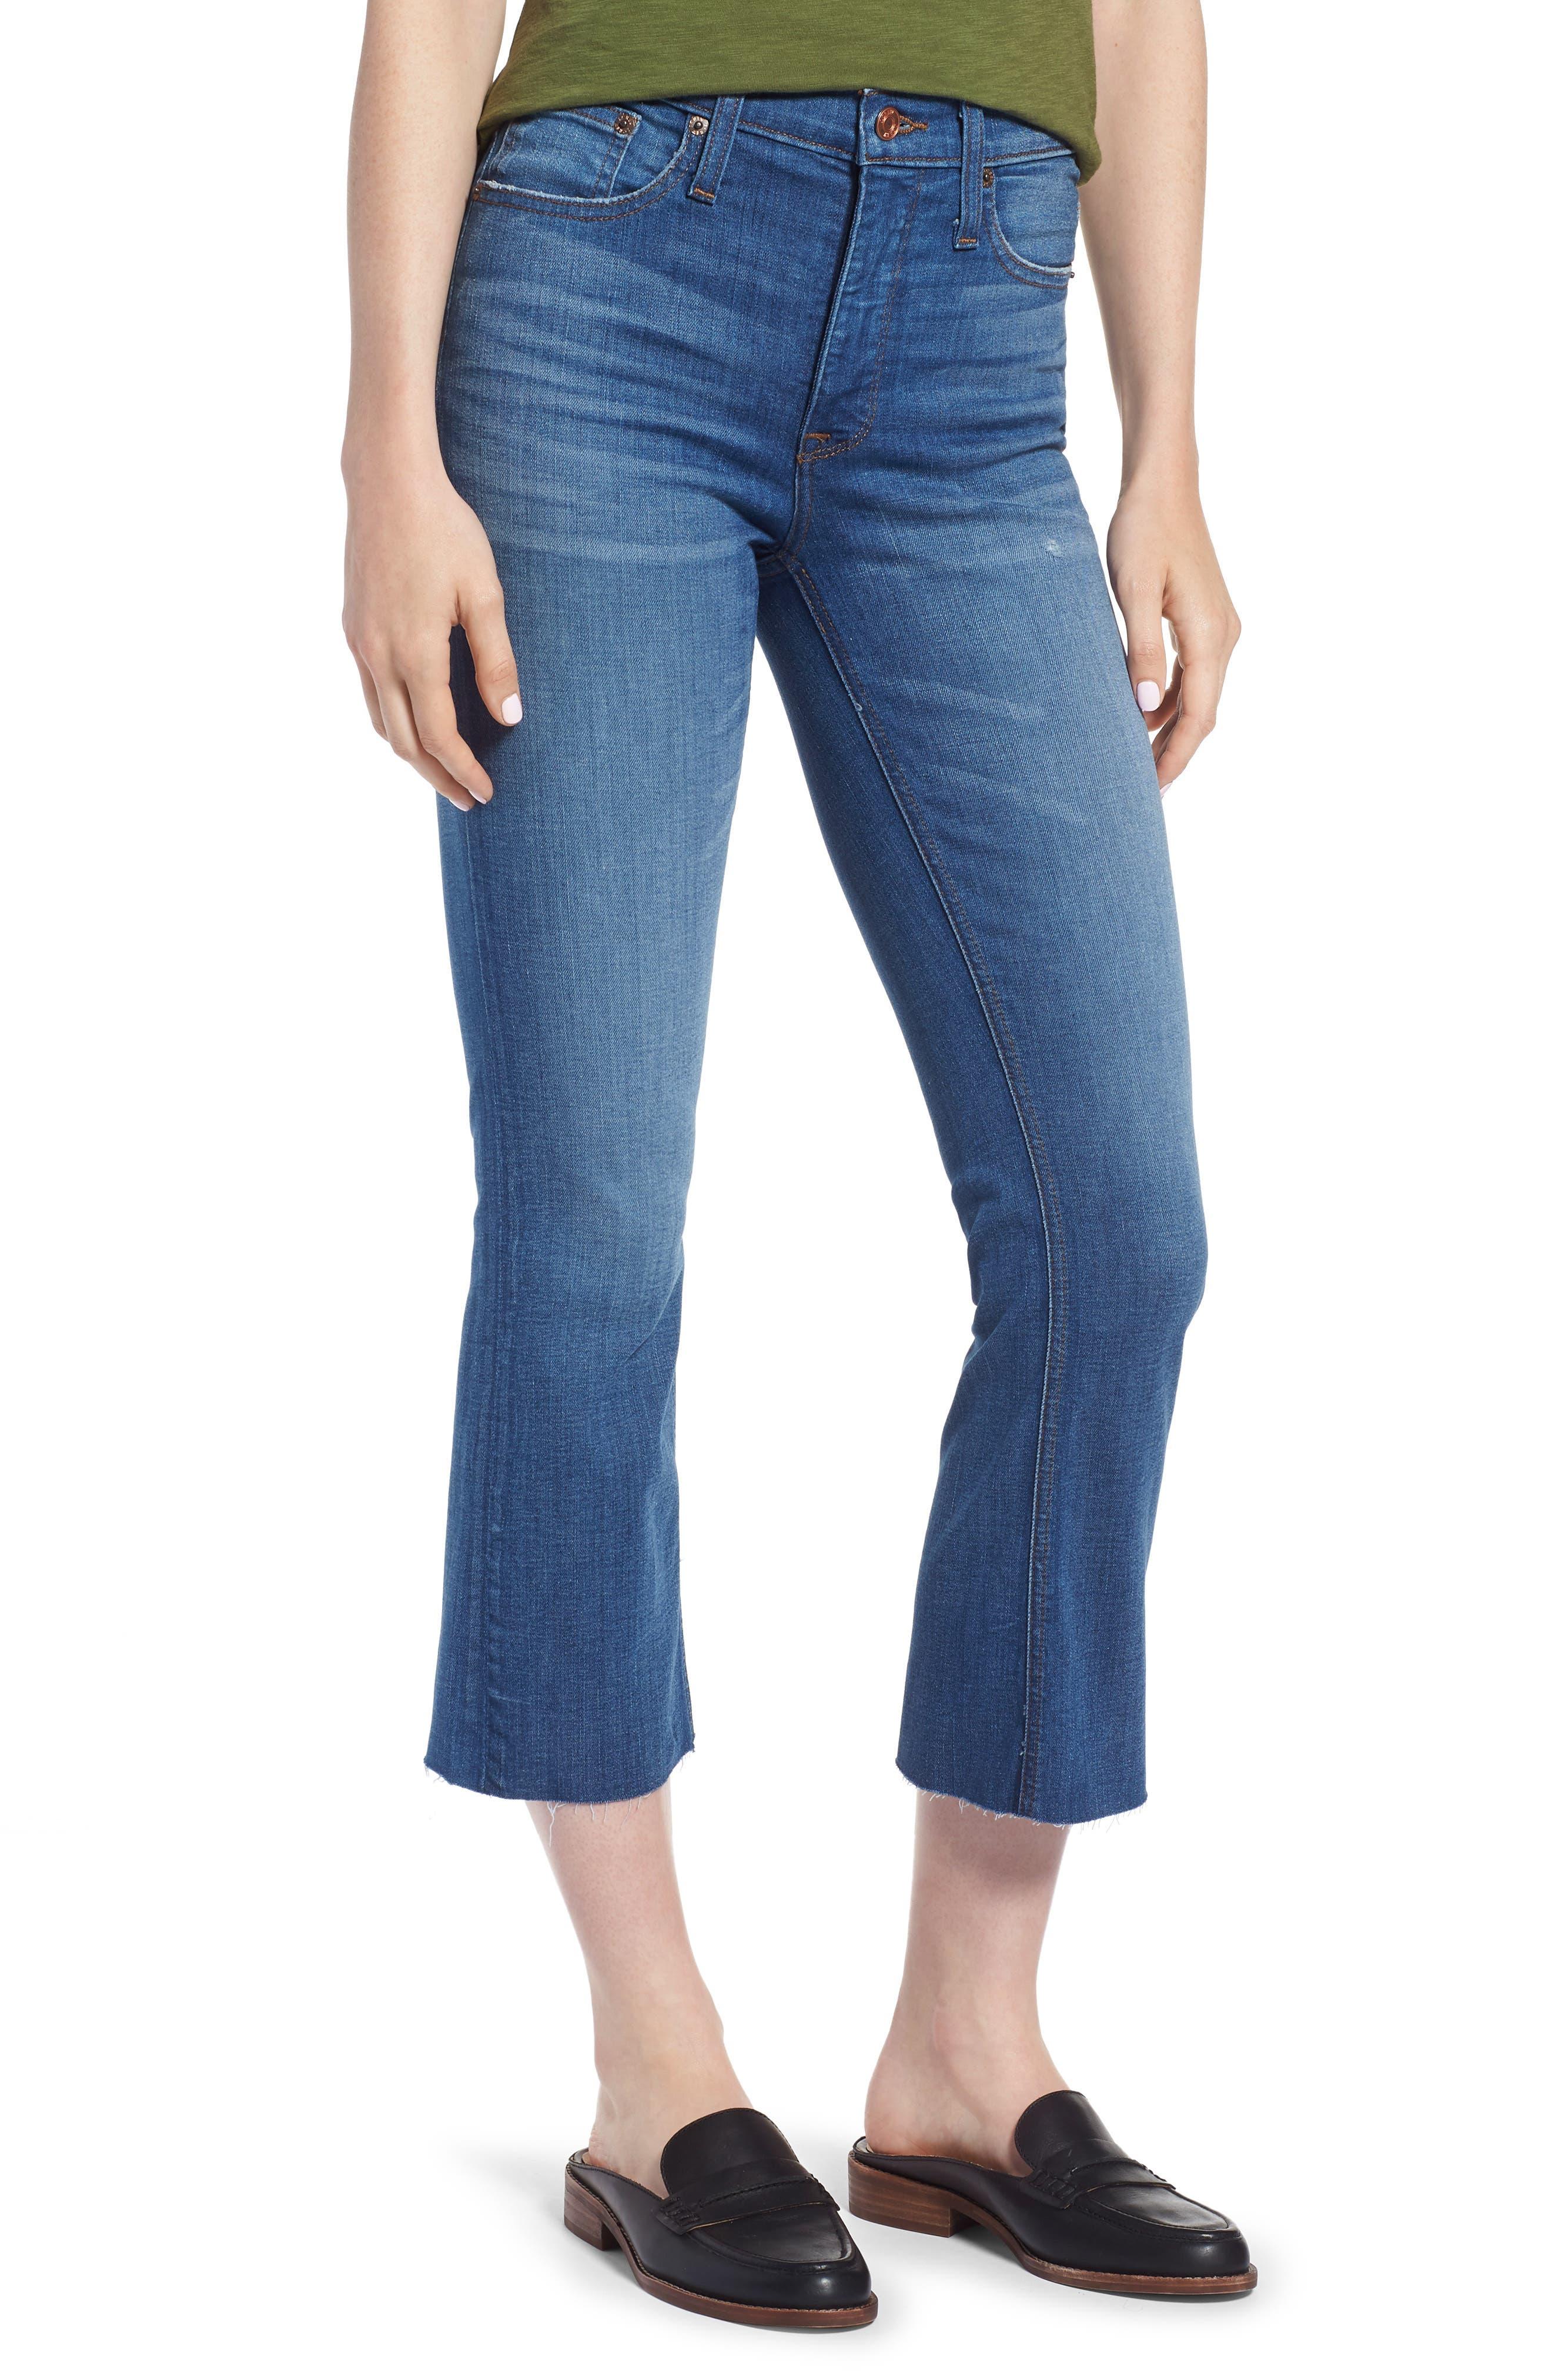 J.Crew Billie Demi-Bootcut Crop Jeans (Hemlock)